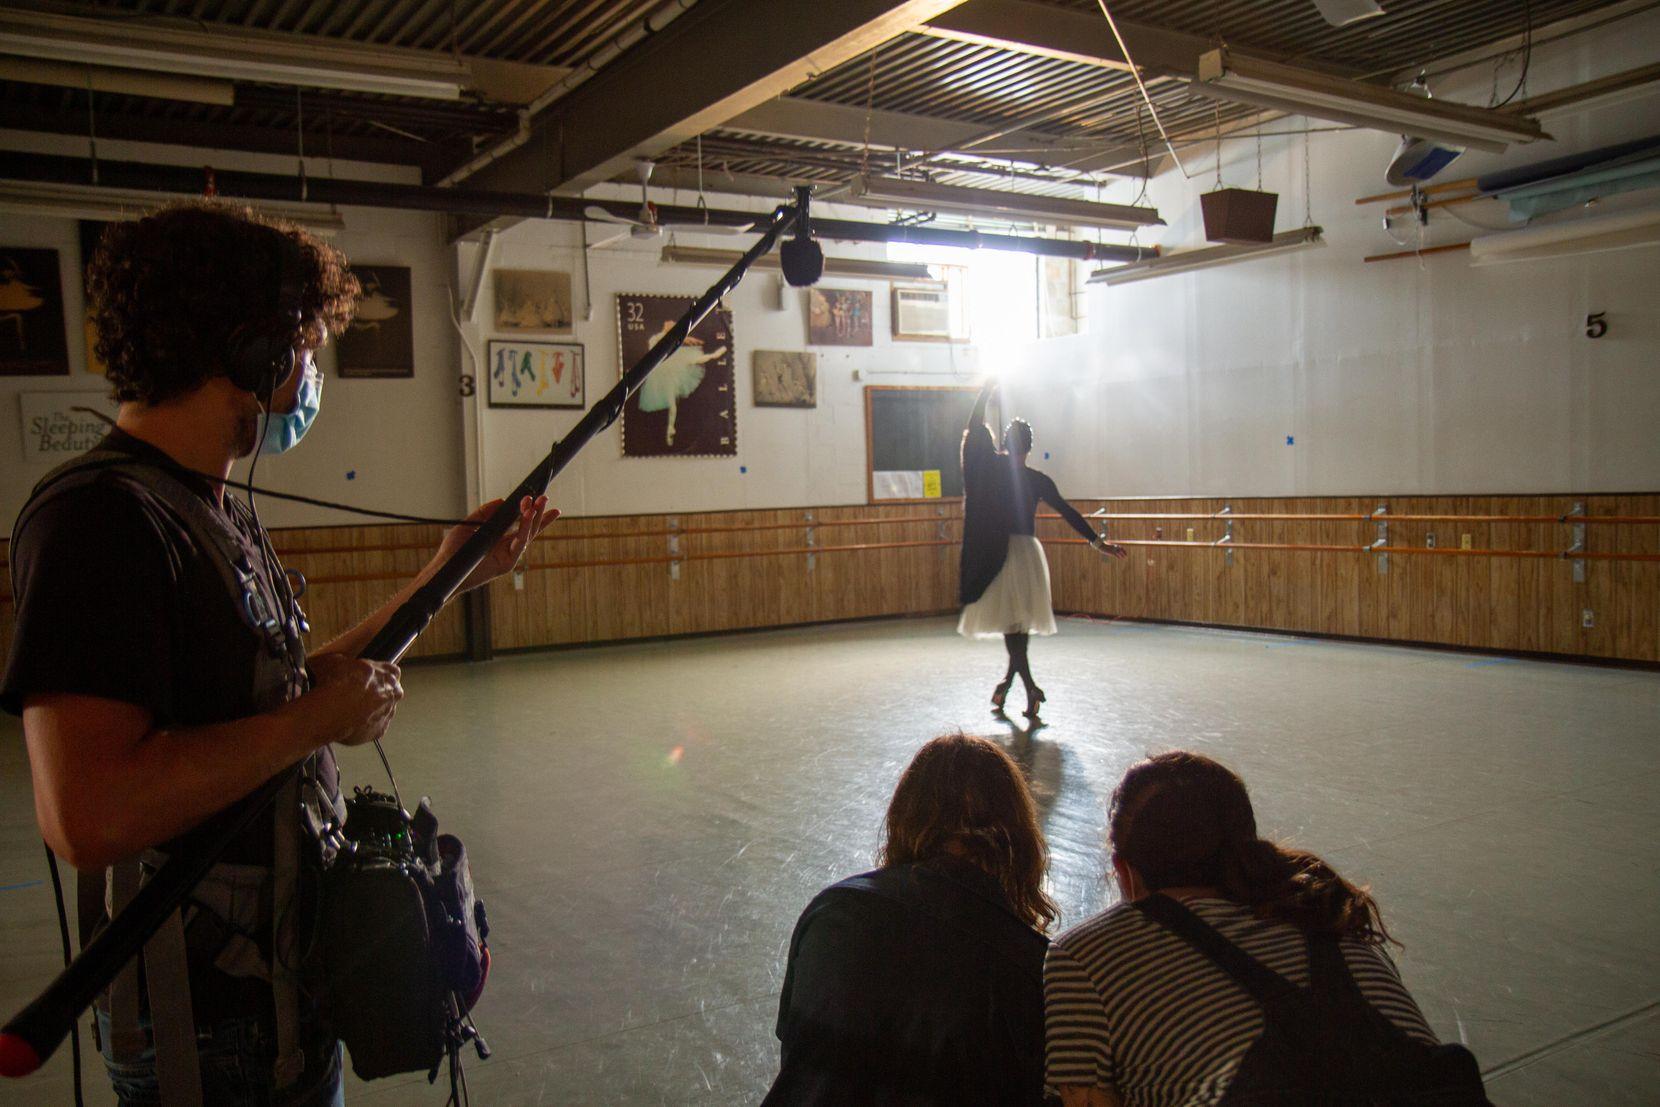 Madame Olga dances in a ballet studio, as a camera crew films her.